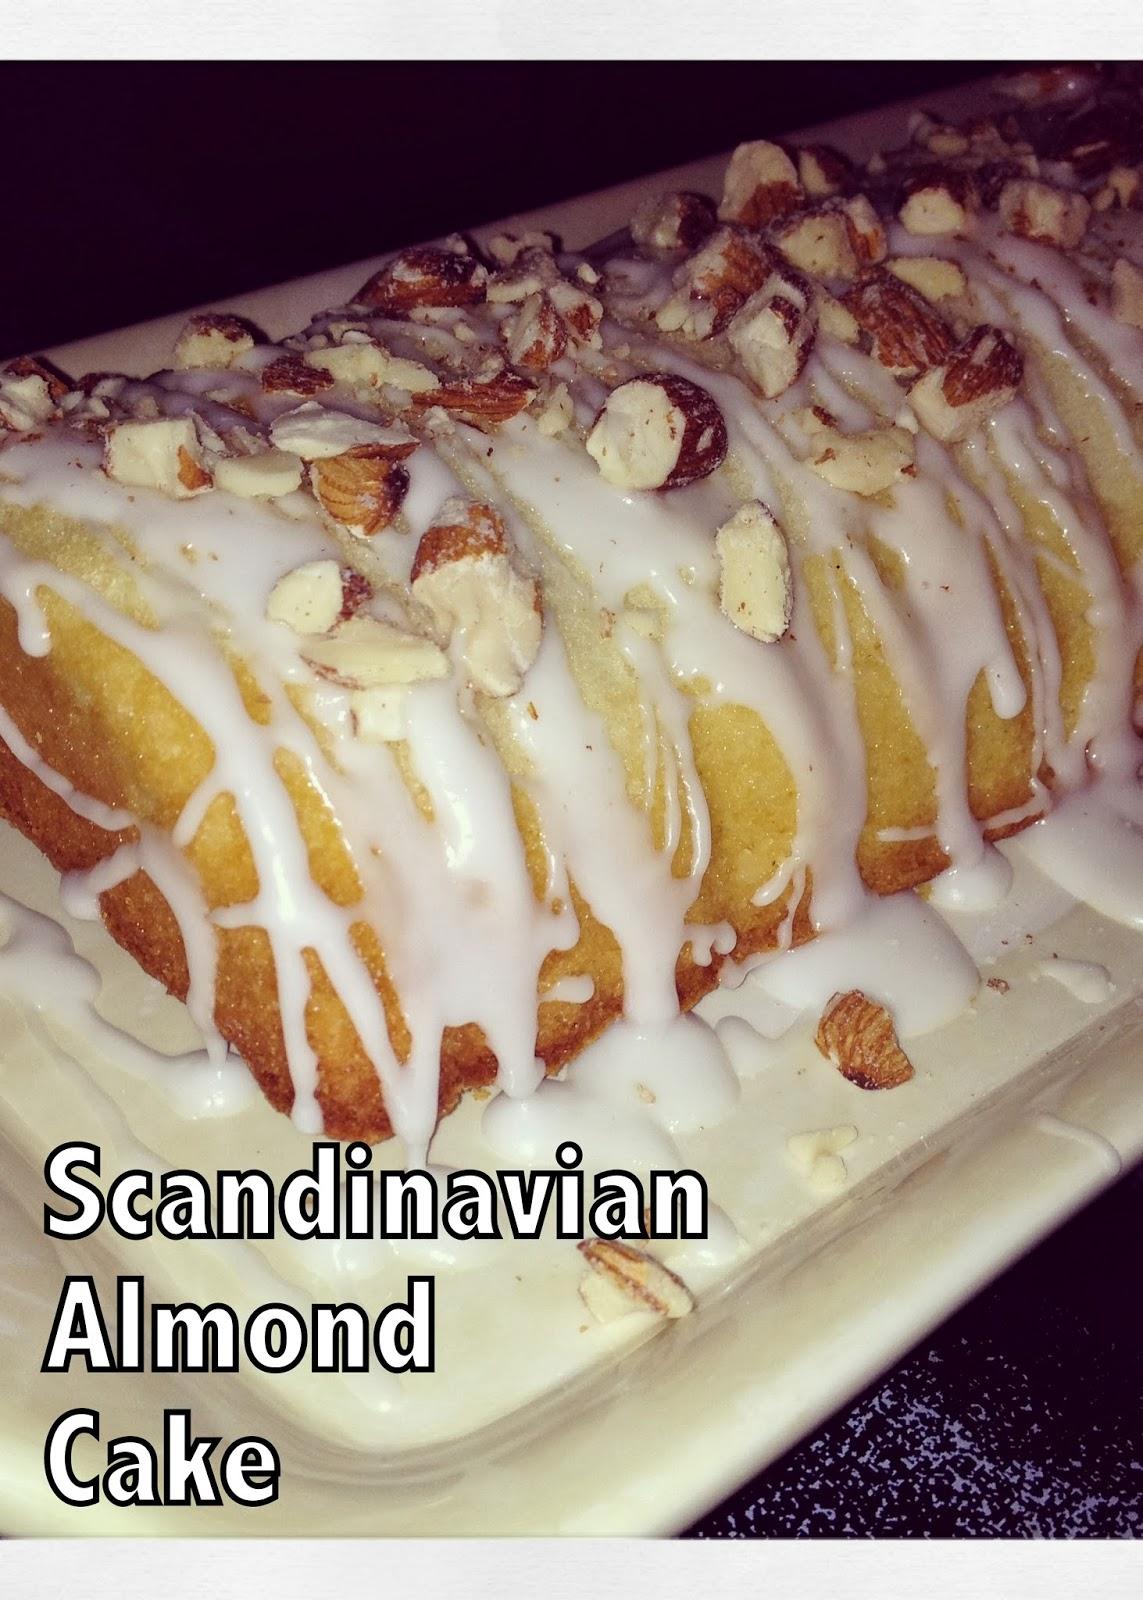 Hunny Bunny Baker Scandinavian Almond Cake